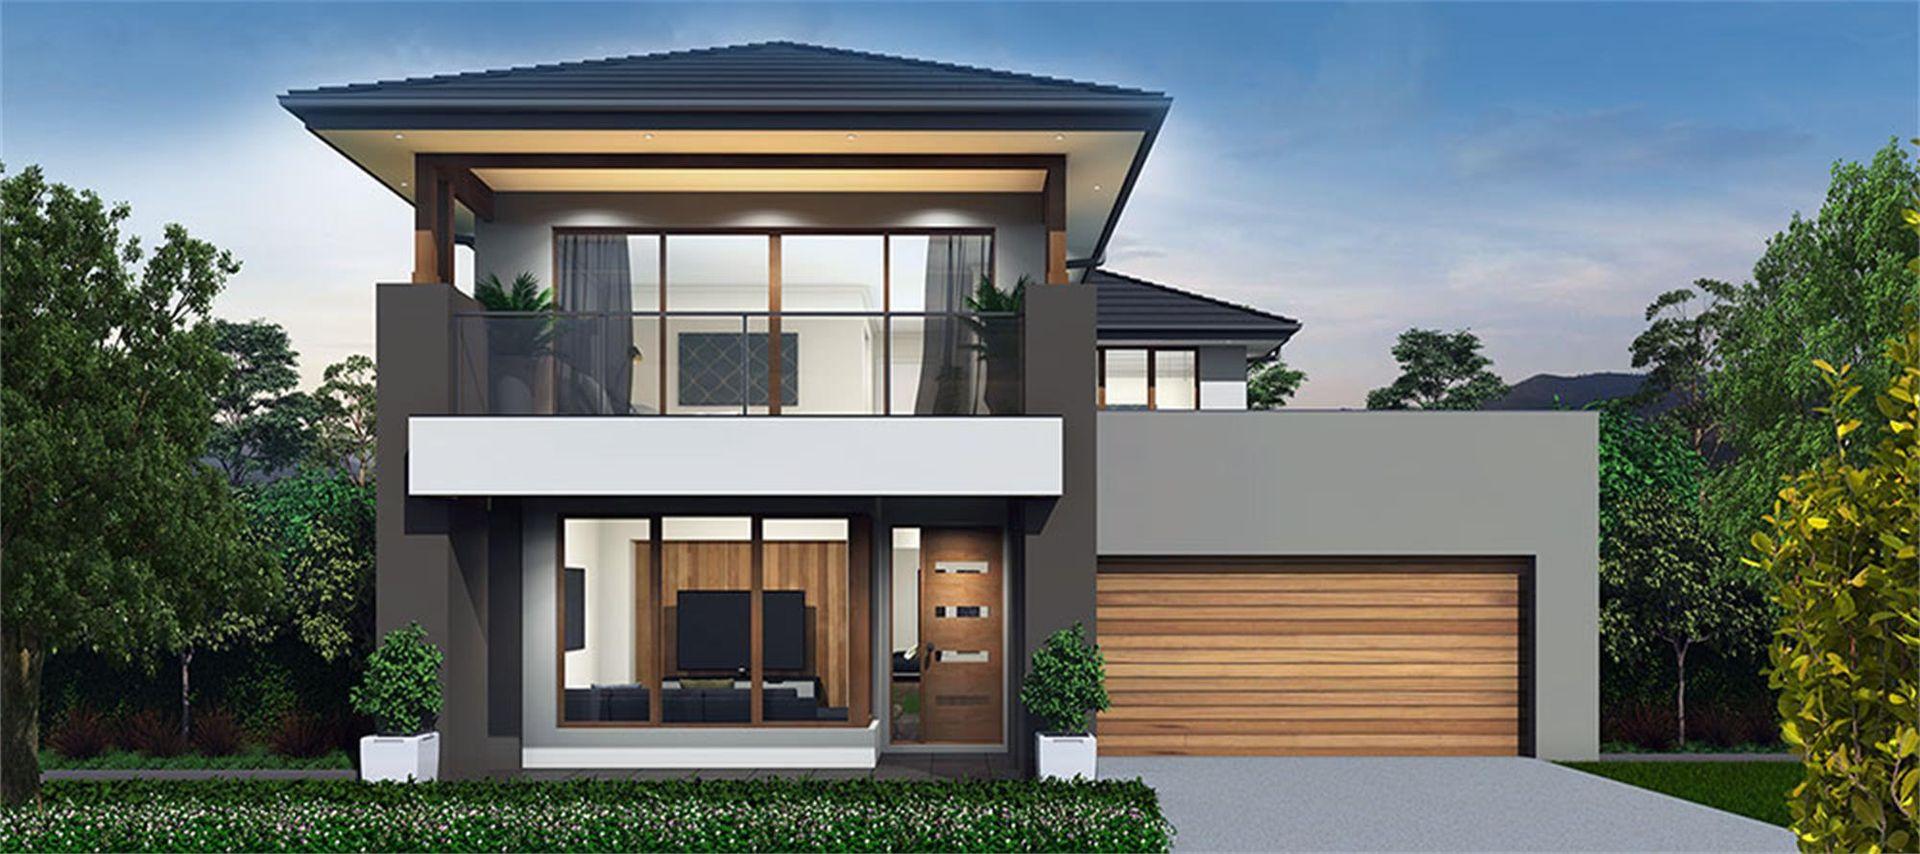 Lot 94 Proposed Rd, Barden Ridge NSW 2234, Image 0